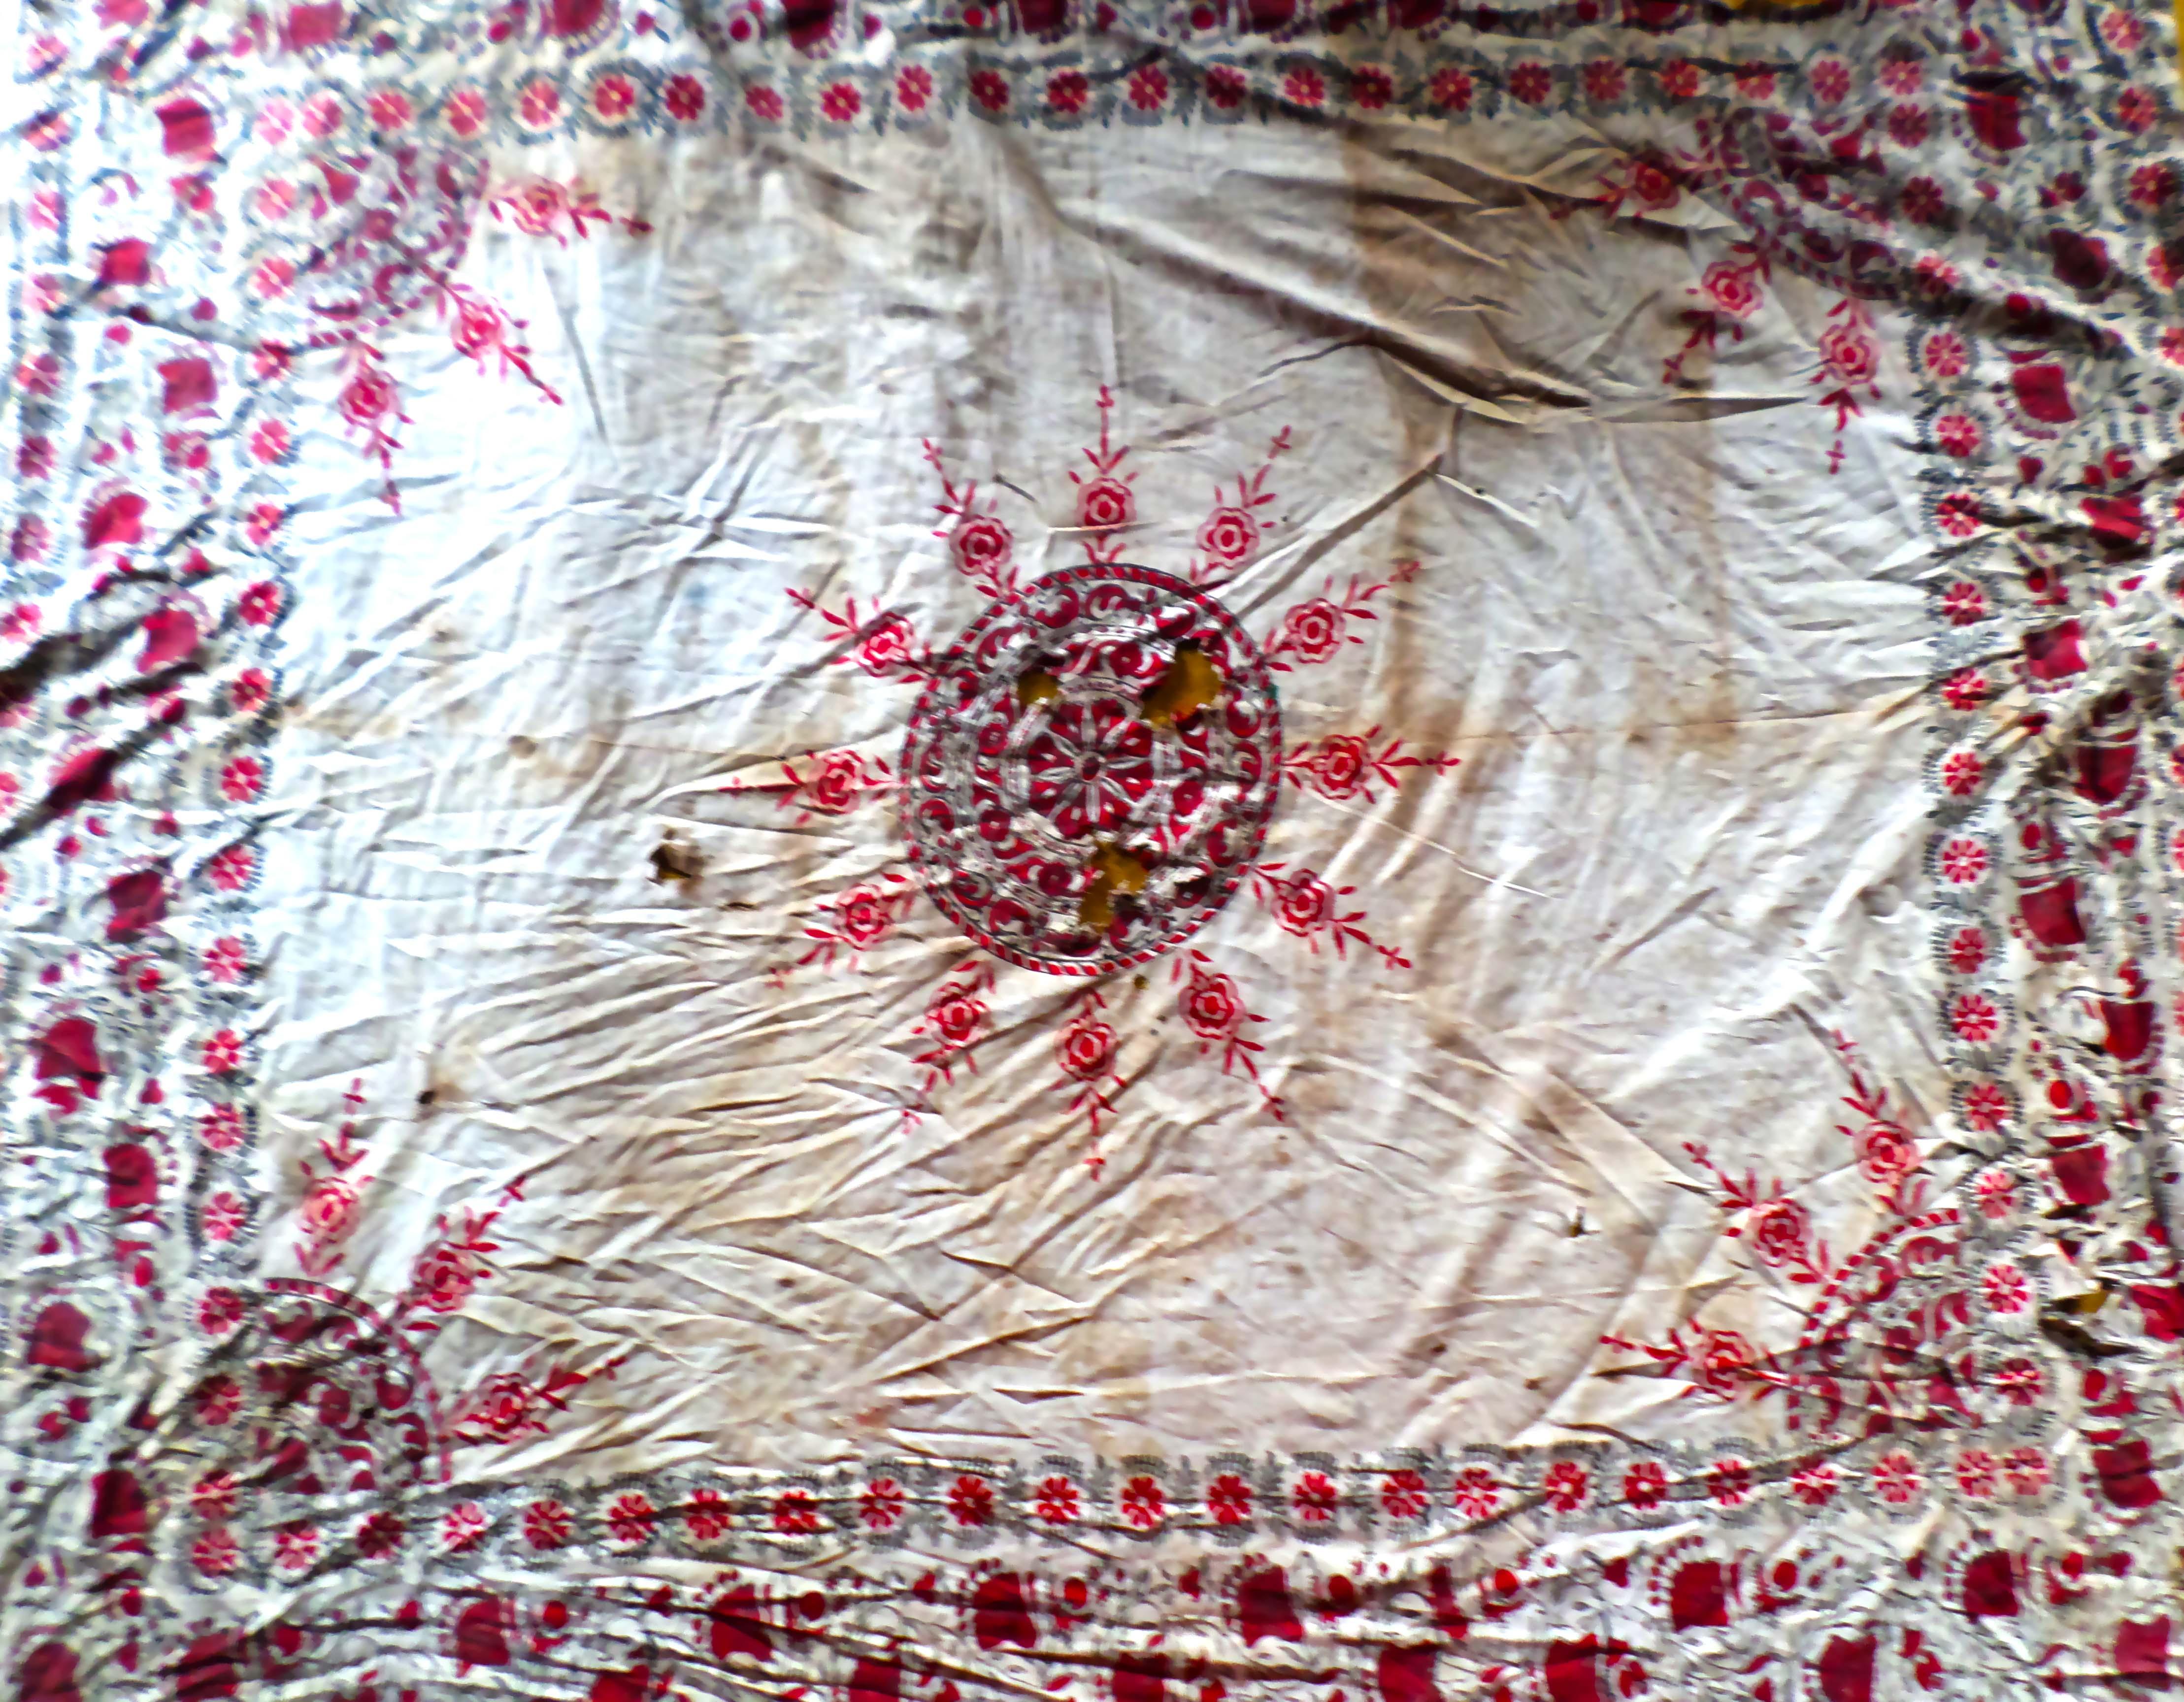 Batik Kuno Dari Bumi Kerinci Oleh H Sunliensyar Selenddang